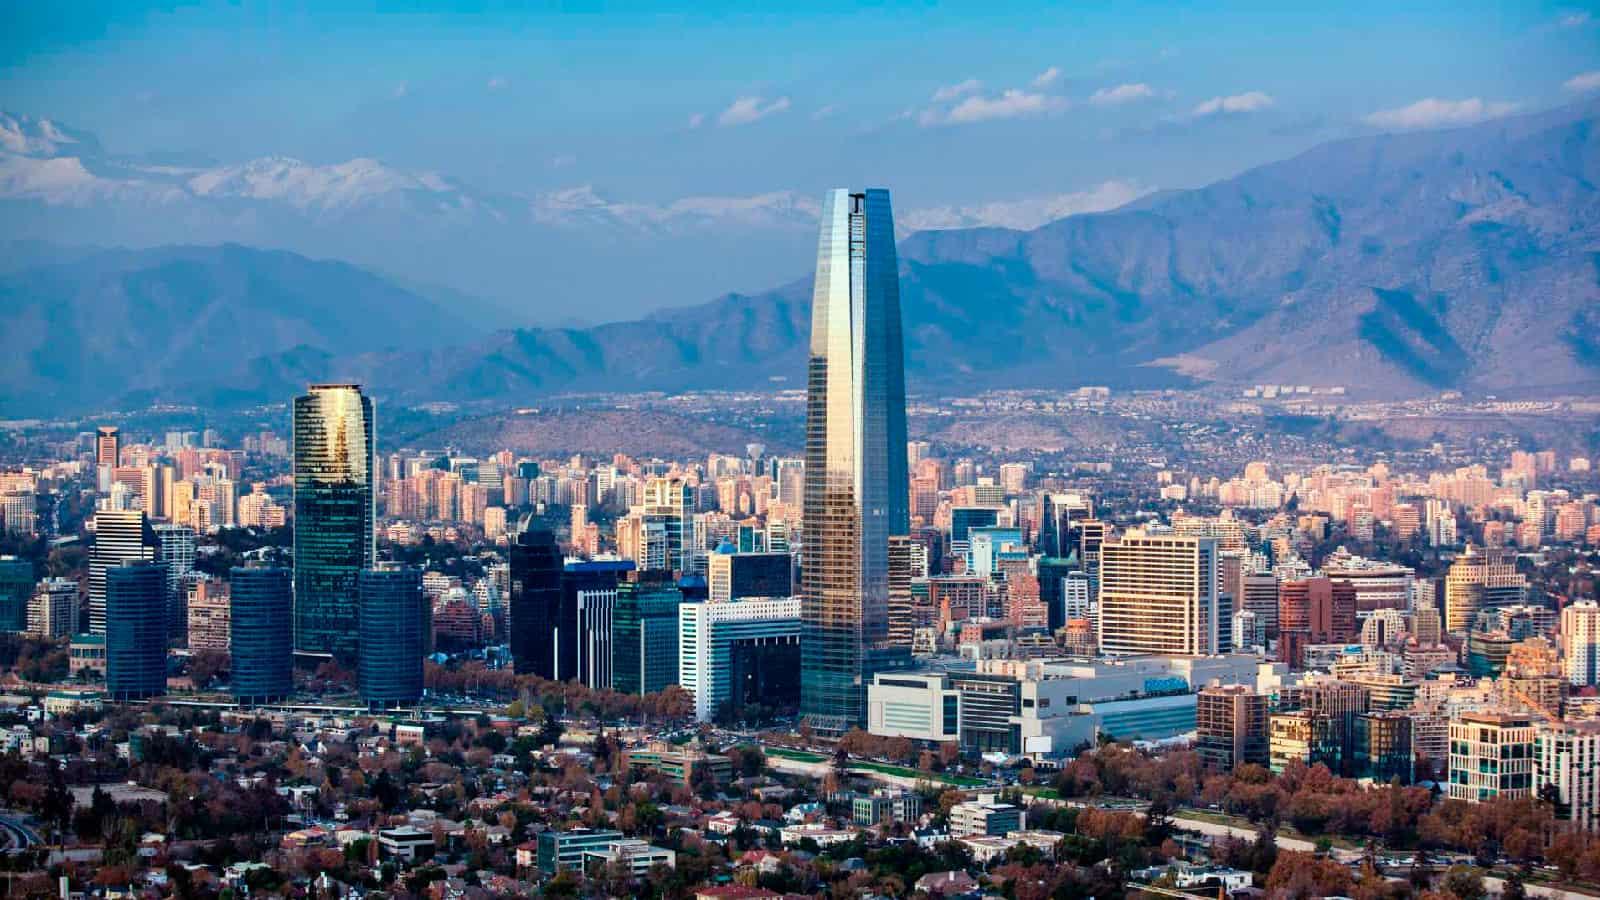 Santiago de Chile, cuna de emprendedores | South American Jets